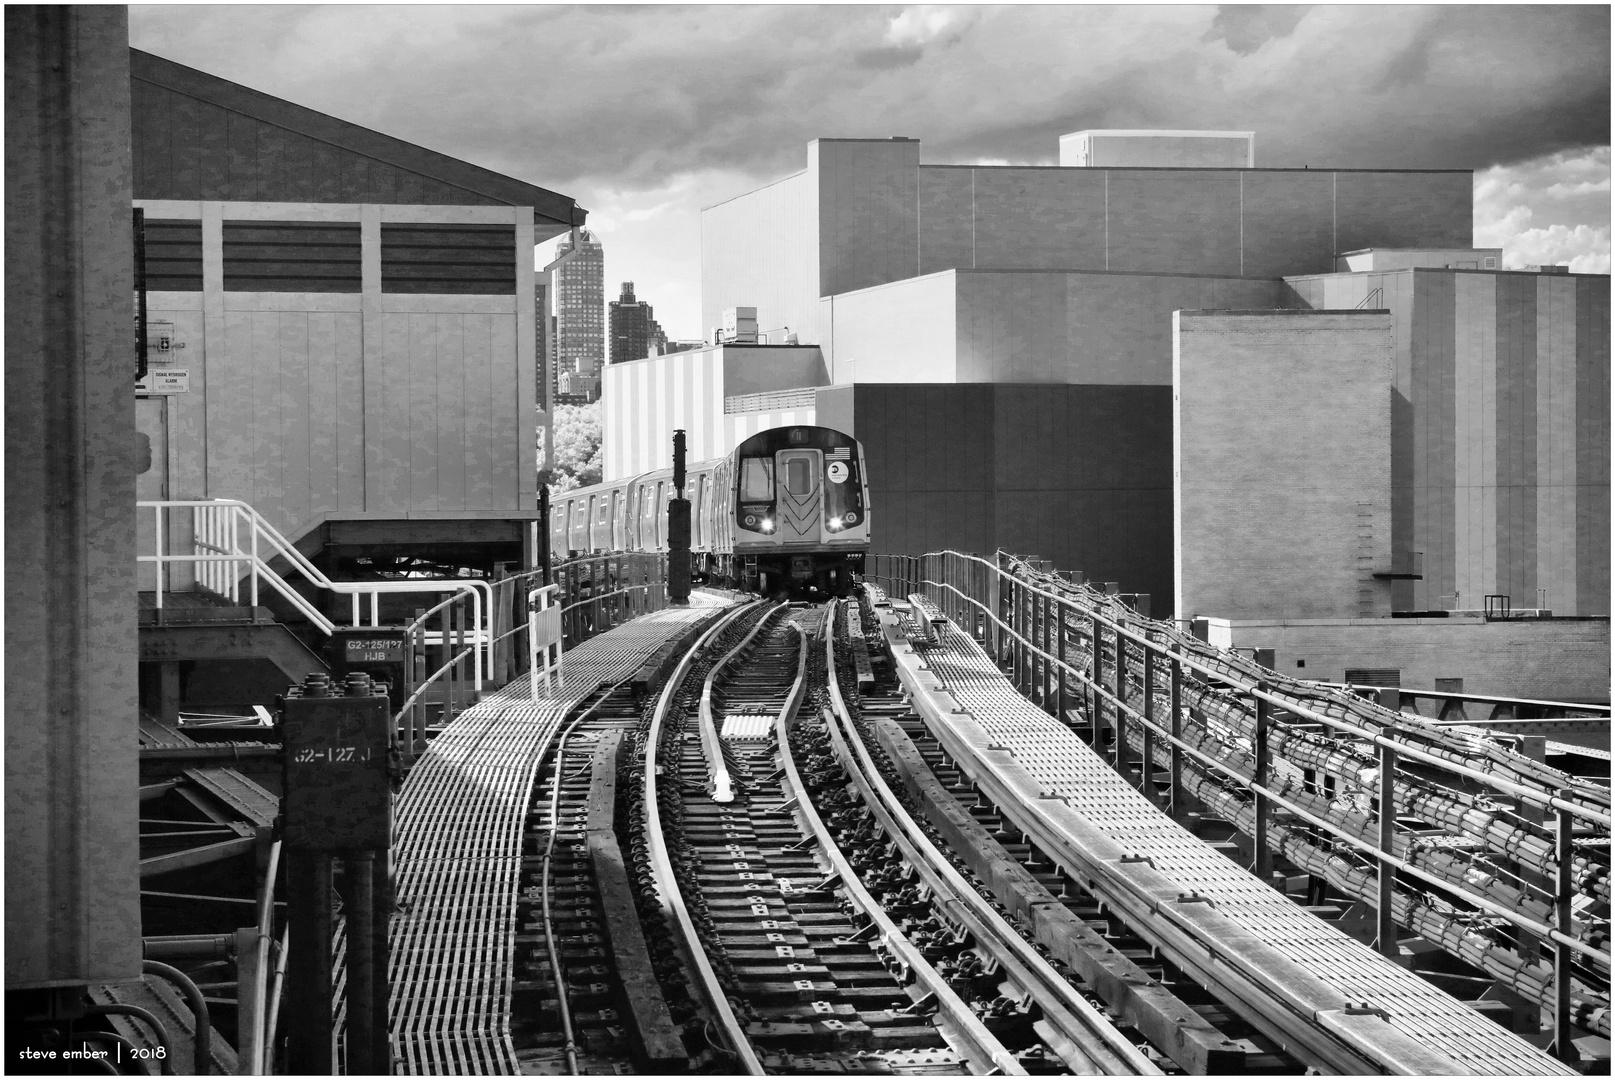 Astoria-bound N Train Approaches Queensboro Plaza Station